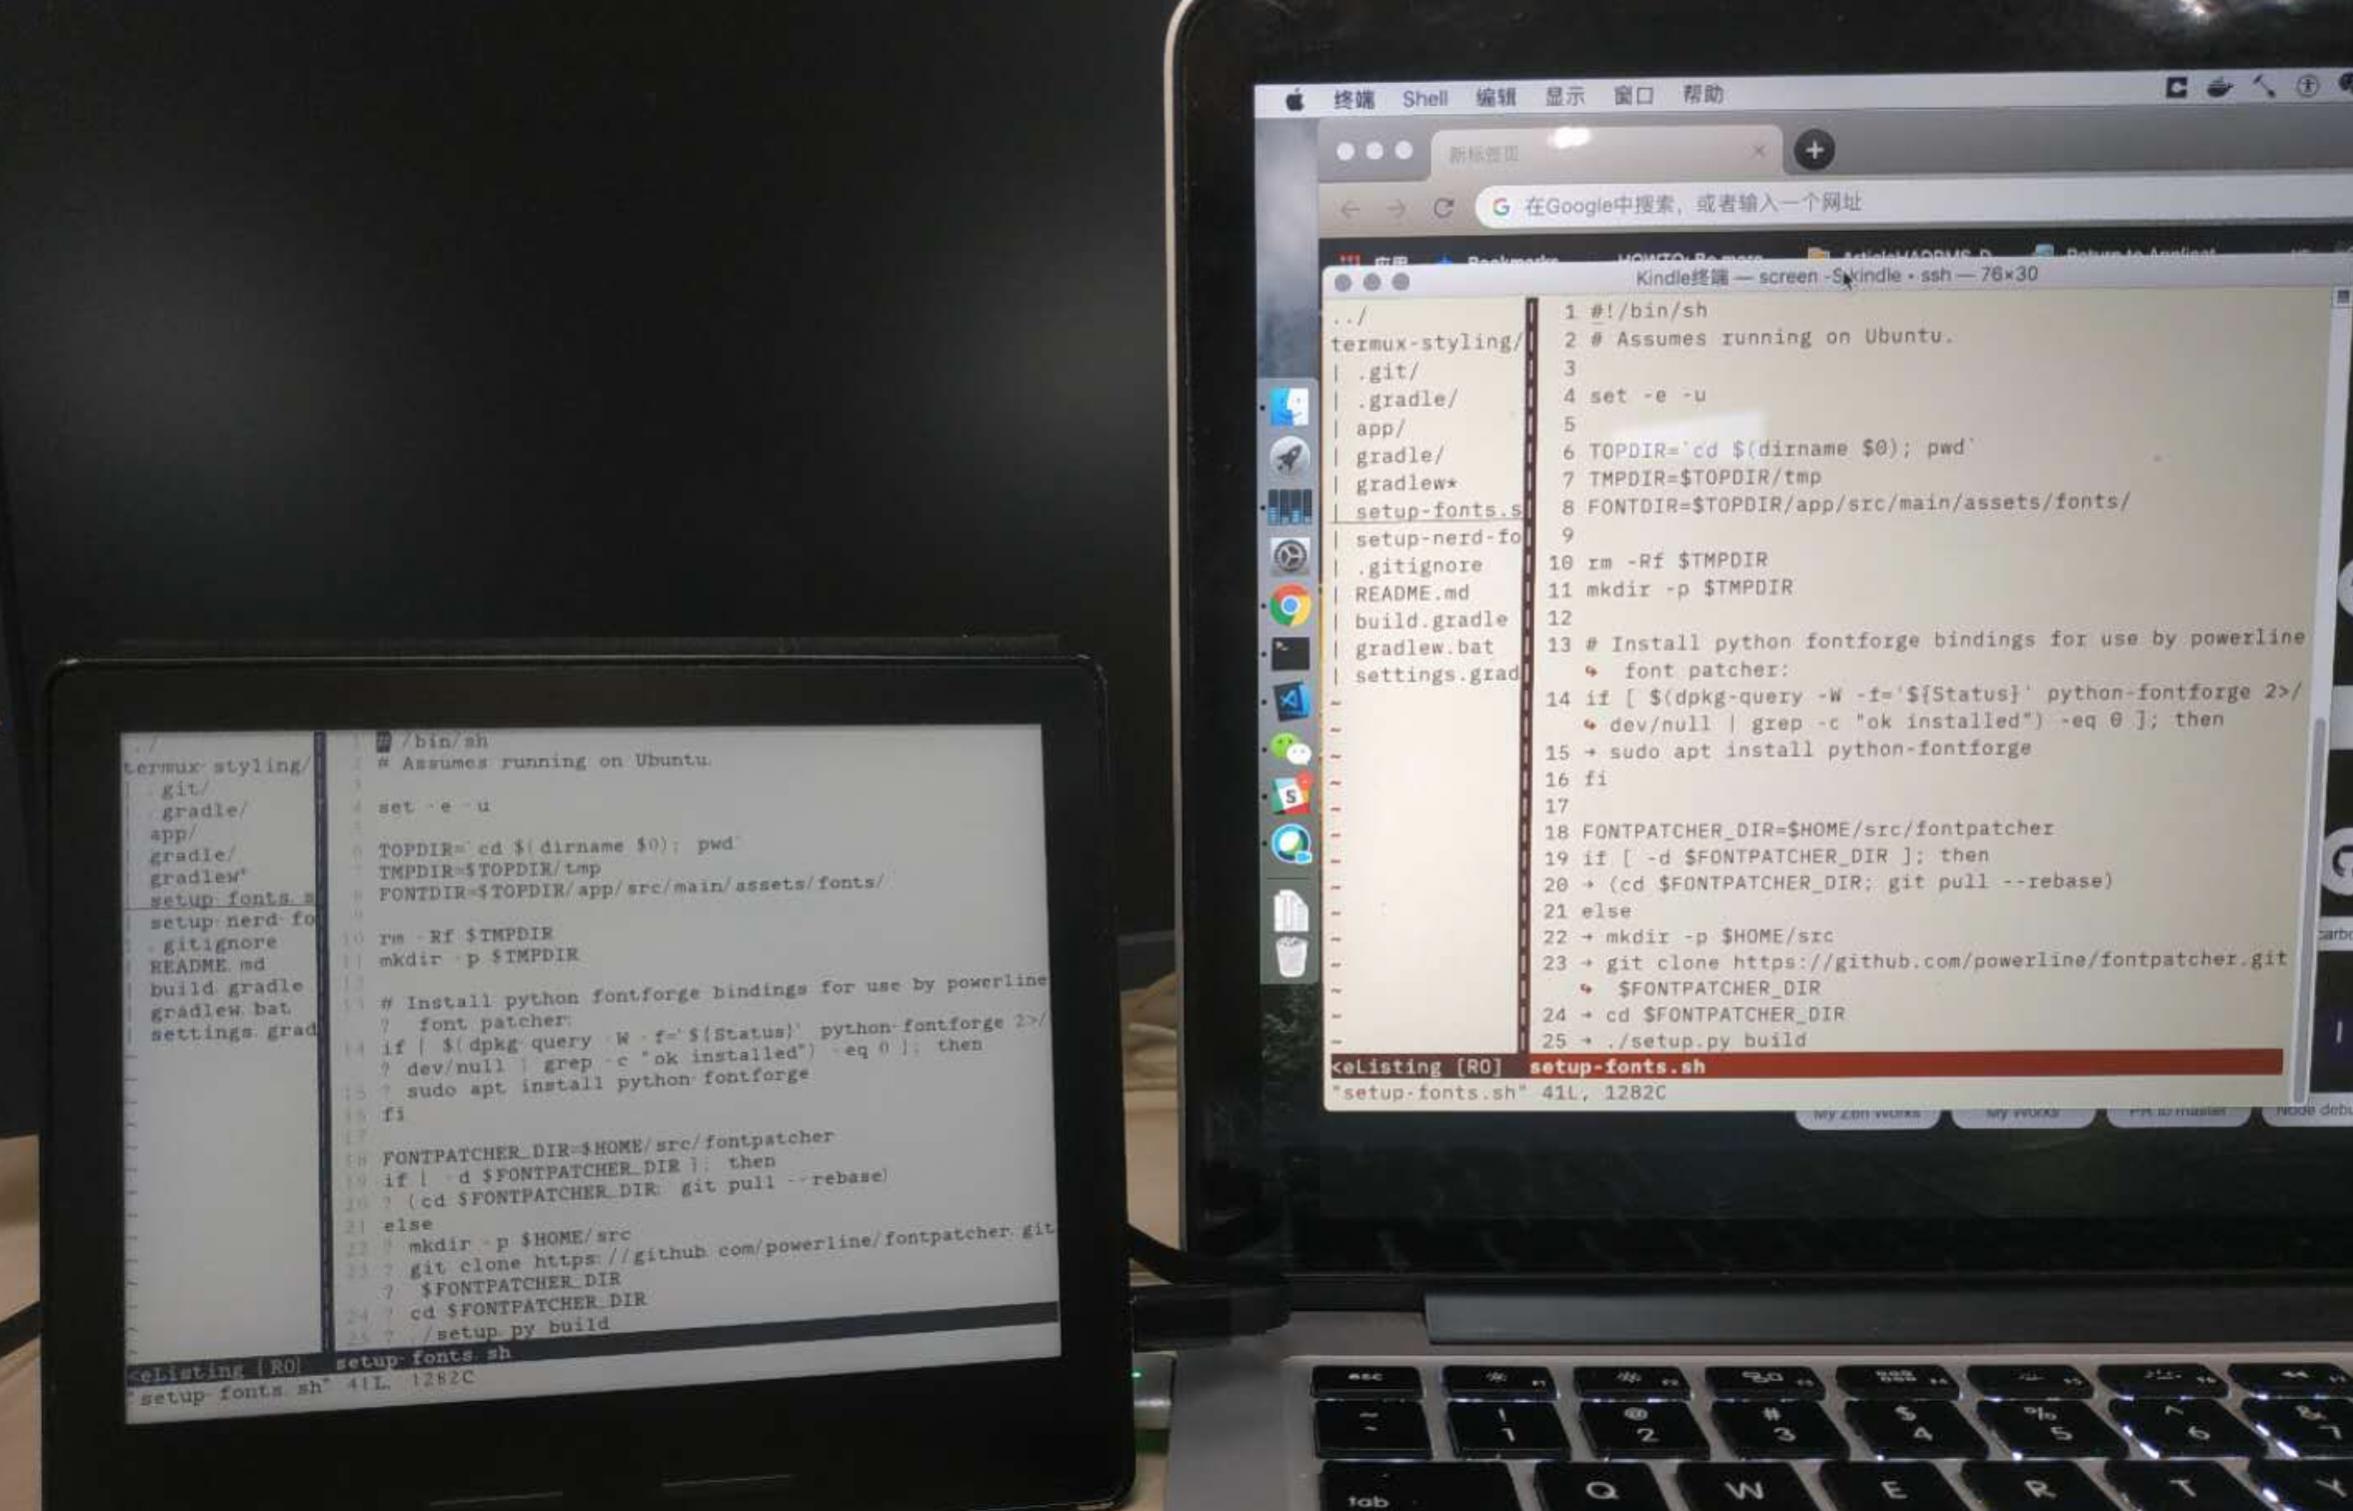 KOA Use kindle as an extra terminal screen - MobileRead Forums